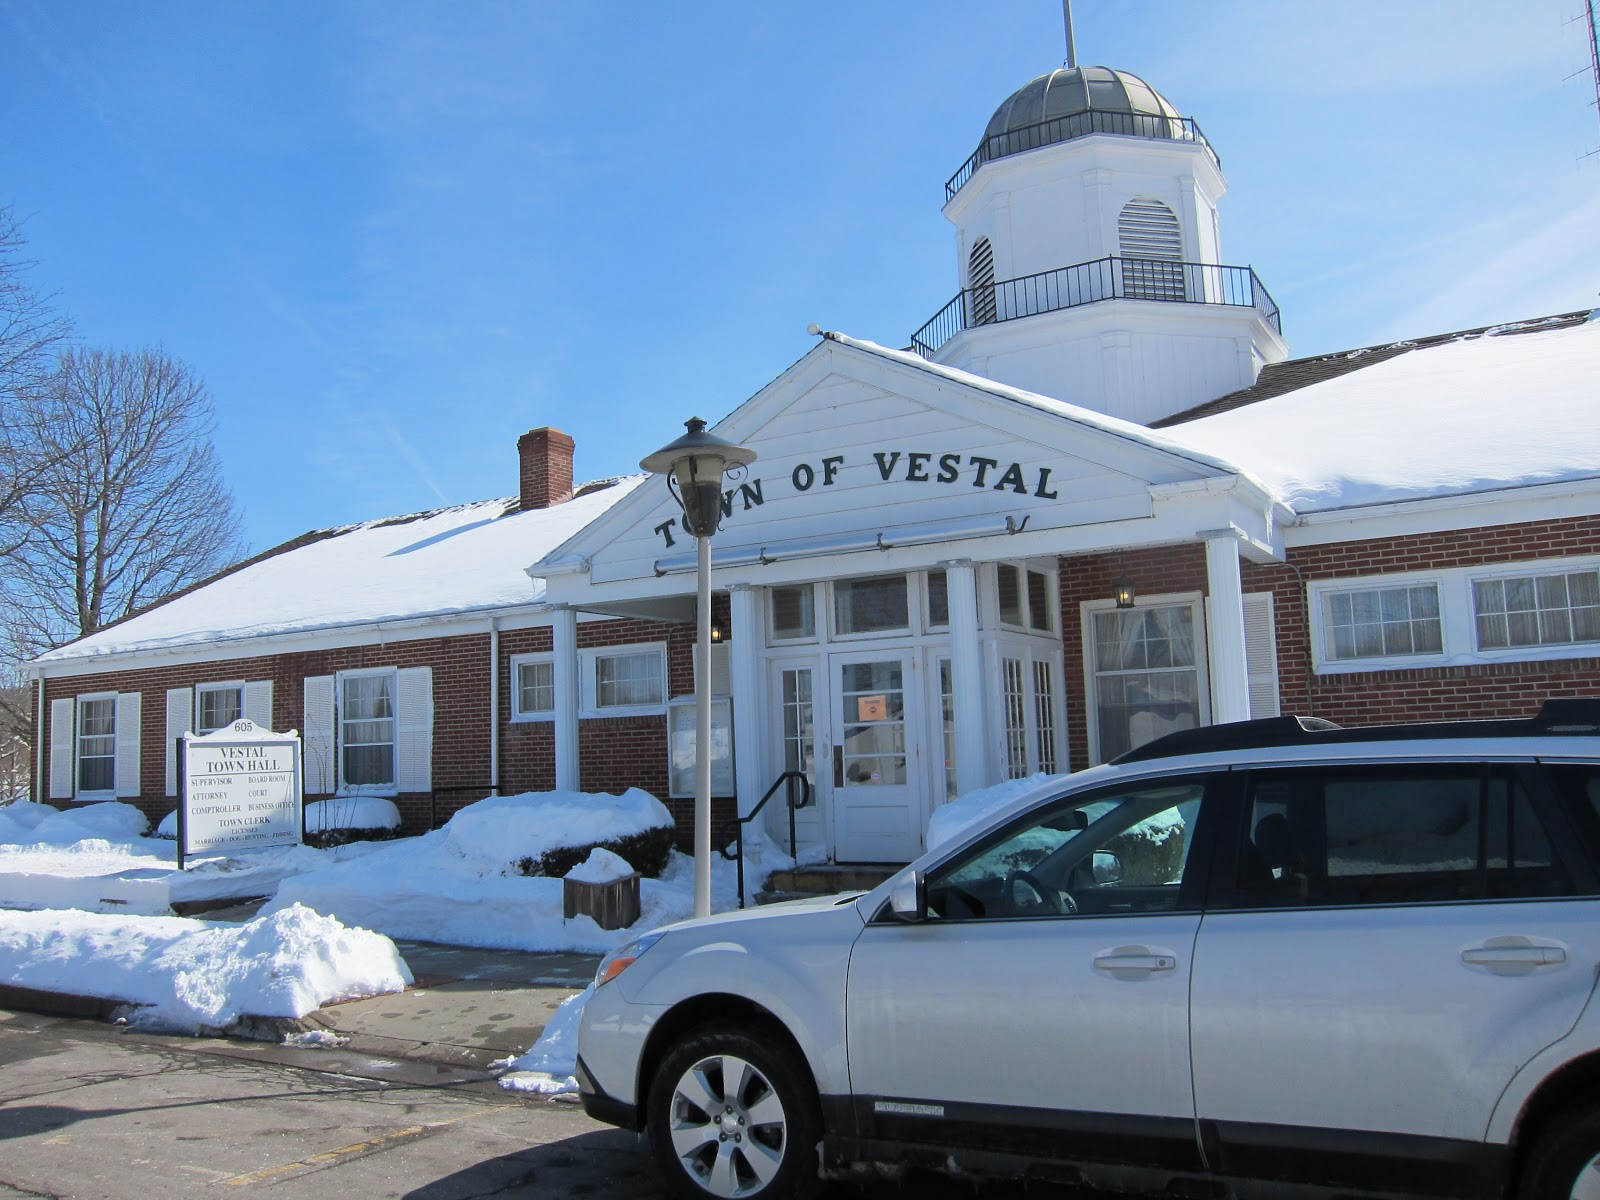 Ithaca Lawyer Blog: Busy Binghamton Lawyer, Vestal Town Courtvestal town